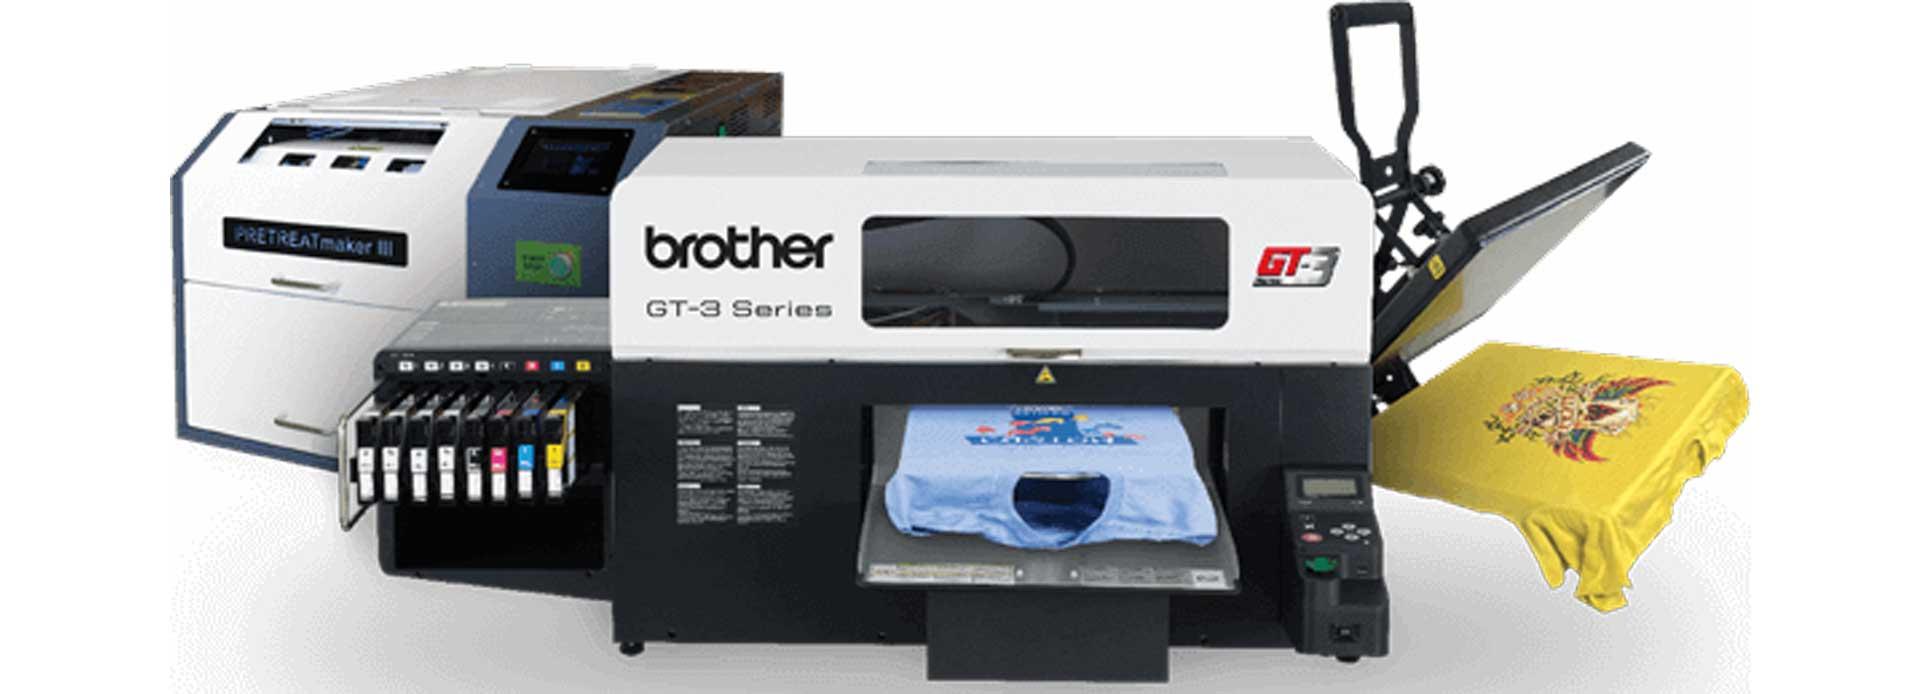 DTG Printing equipment